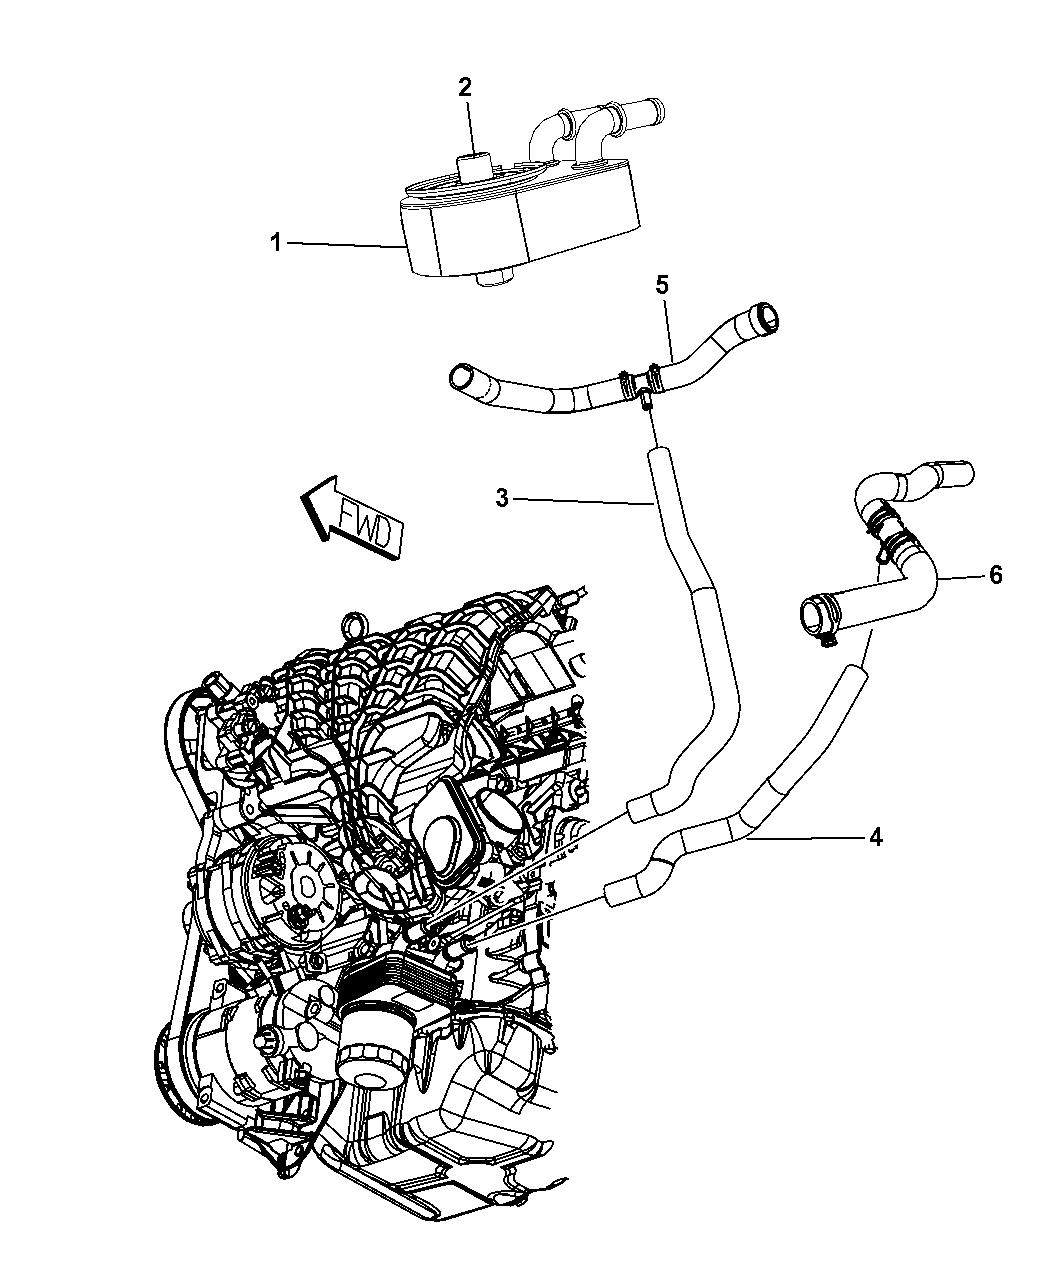 2009 Dodge Journey Cooling System Diagram - Hanenhuusholli